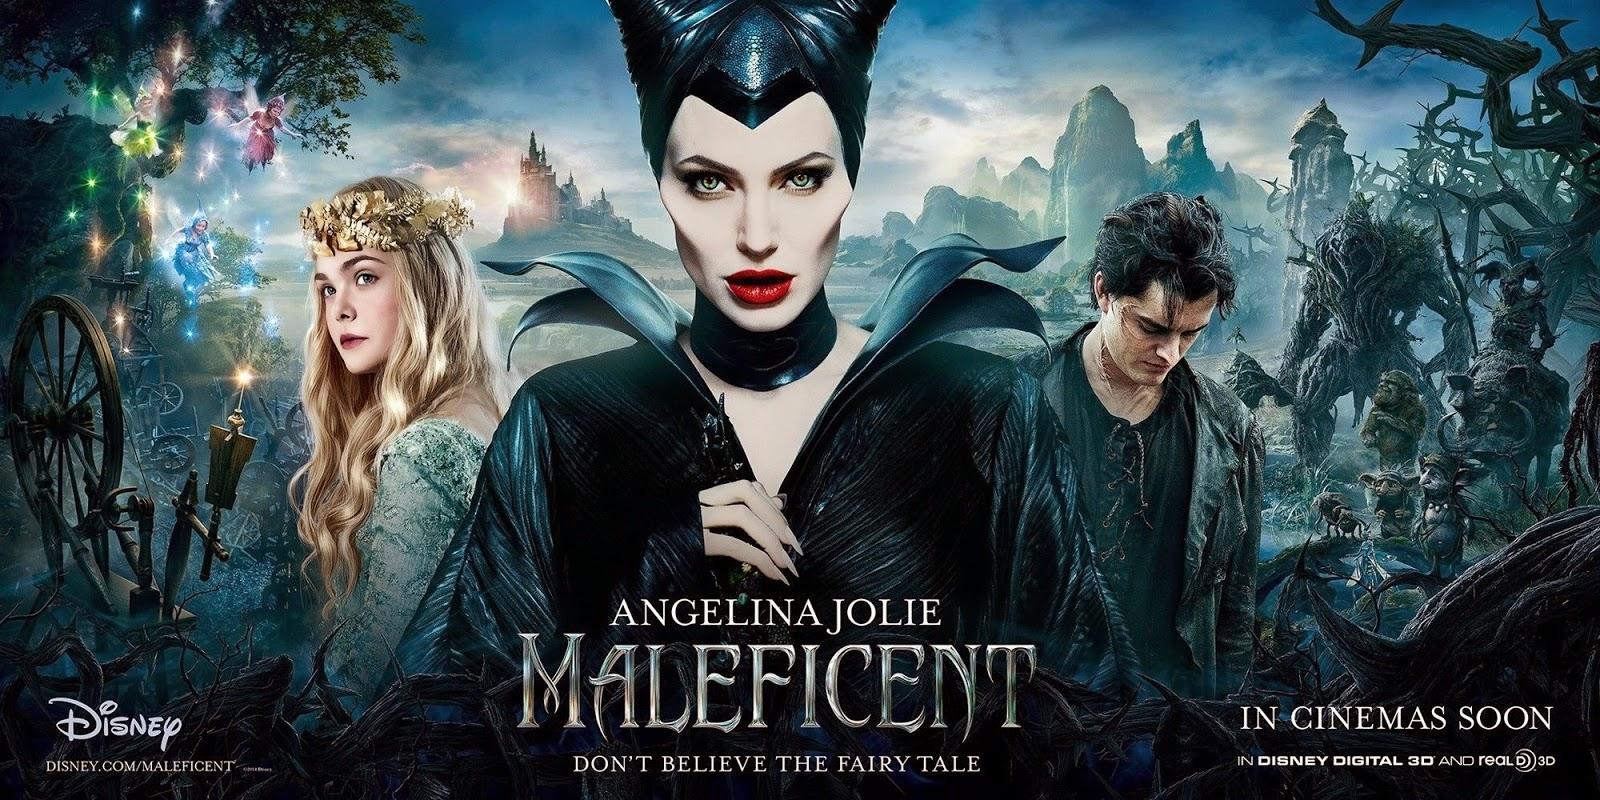 Maleficent 2014 Usa Brrip 1080p Yify 1430 Mb Google Drive Sejarah